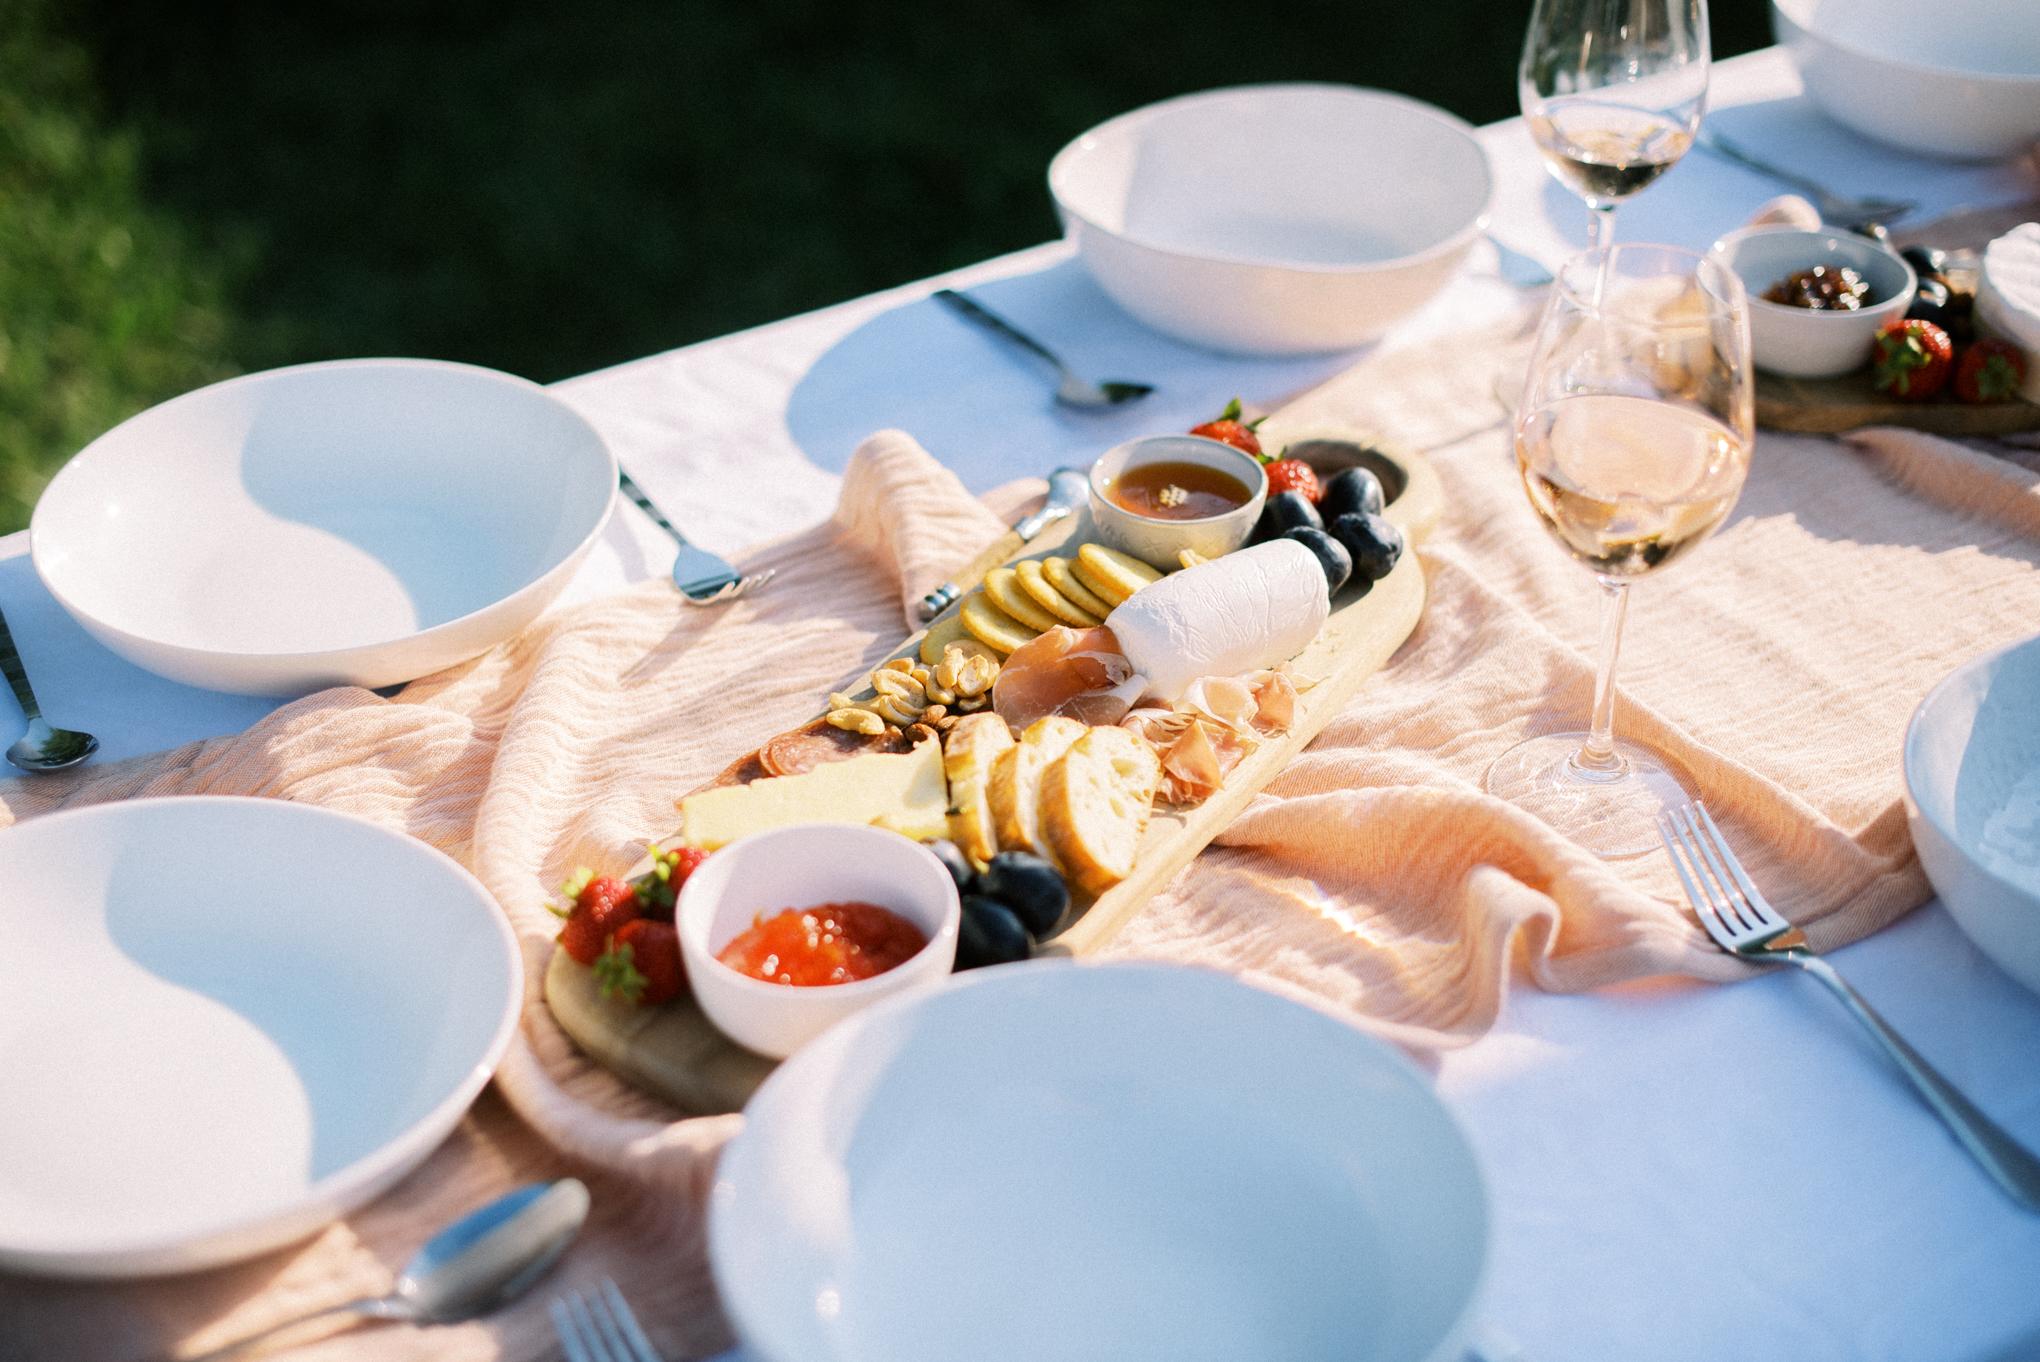 Backyard_Summer_Dinner_Party_Tonya_Espy_Photography-13.jpg